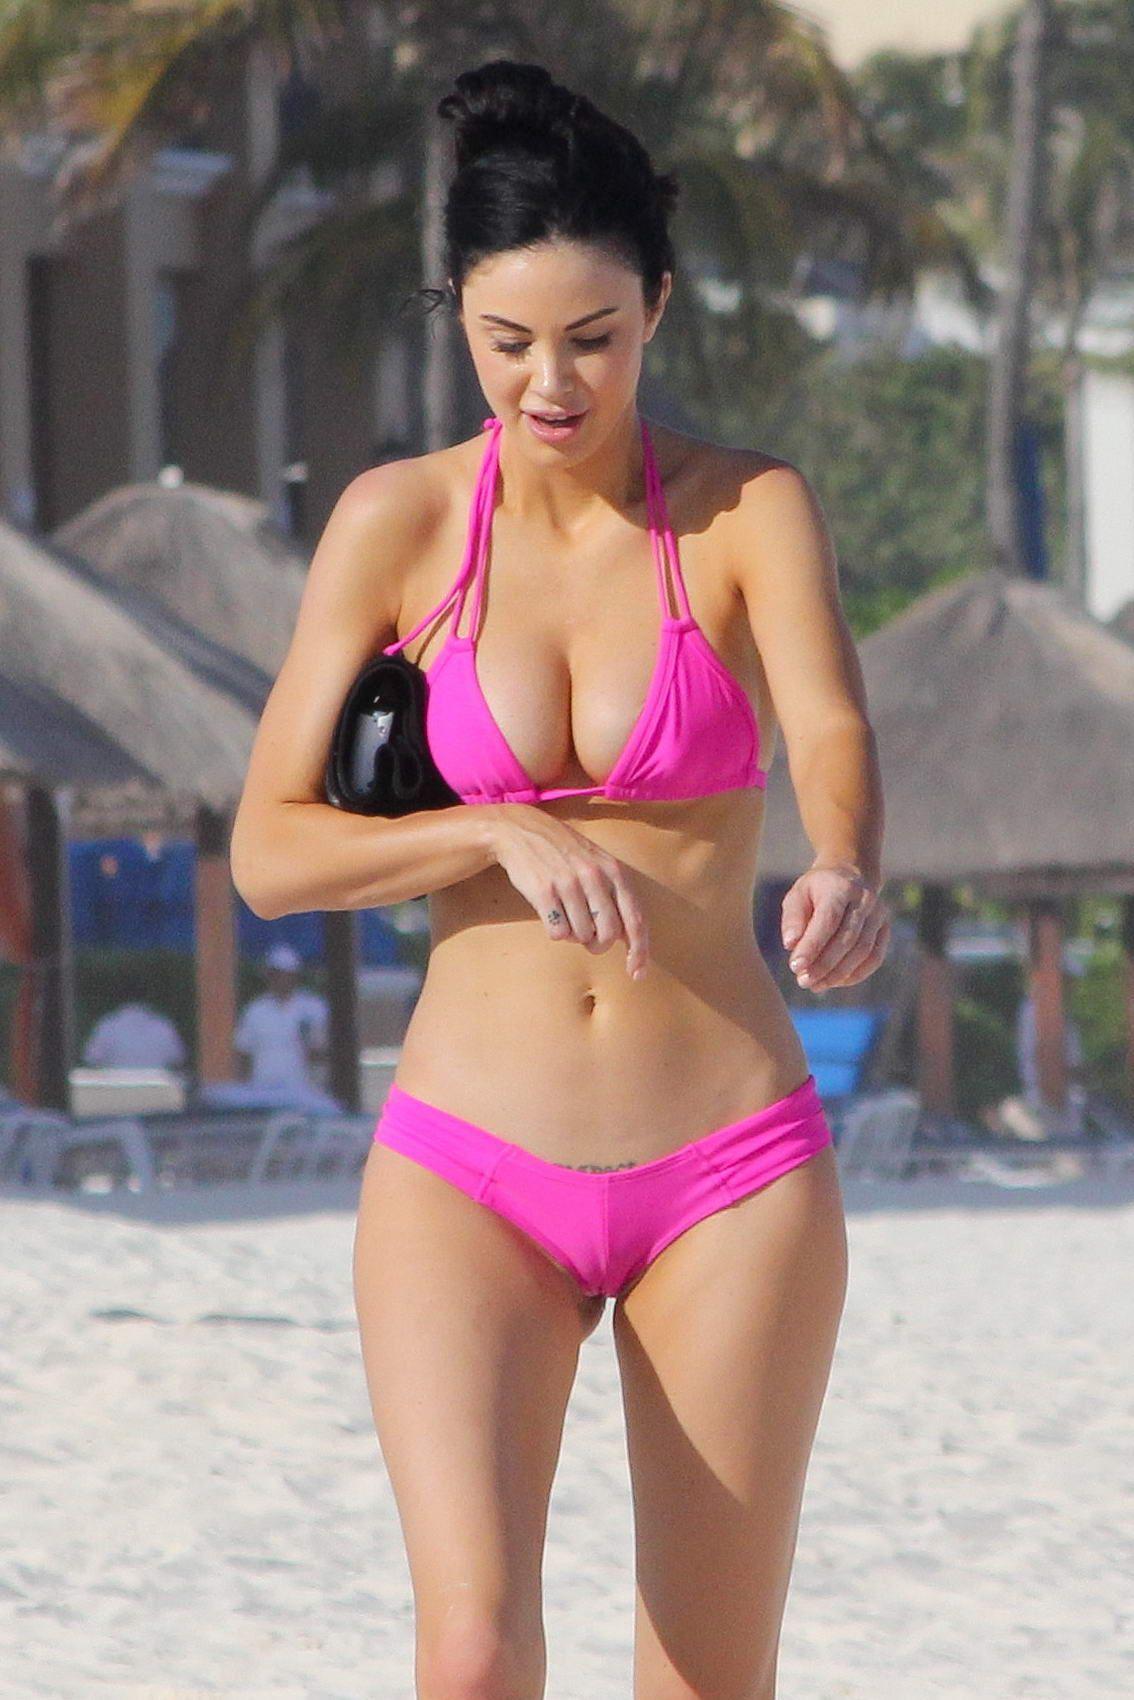 Jayde-Nicole-in-a-Bikini-1